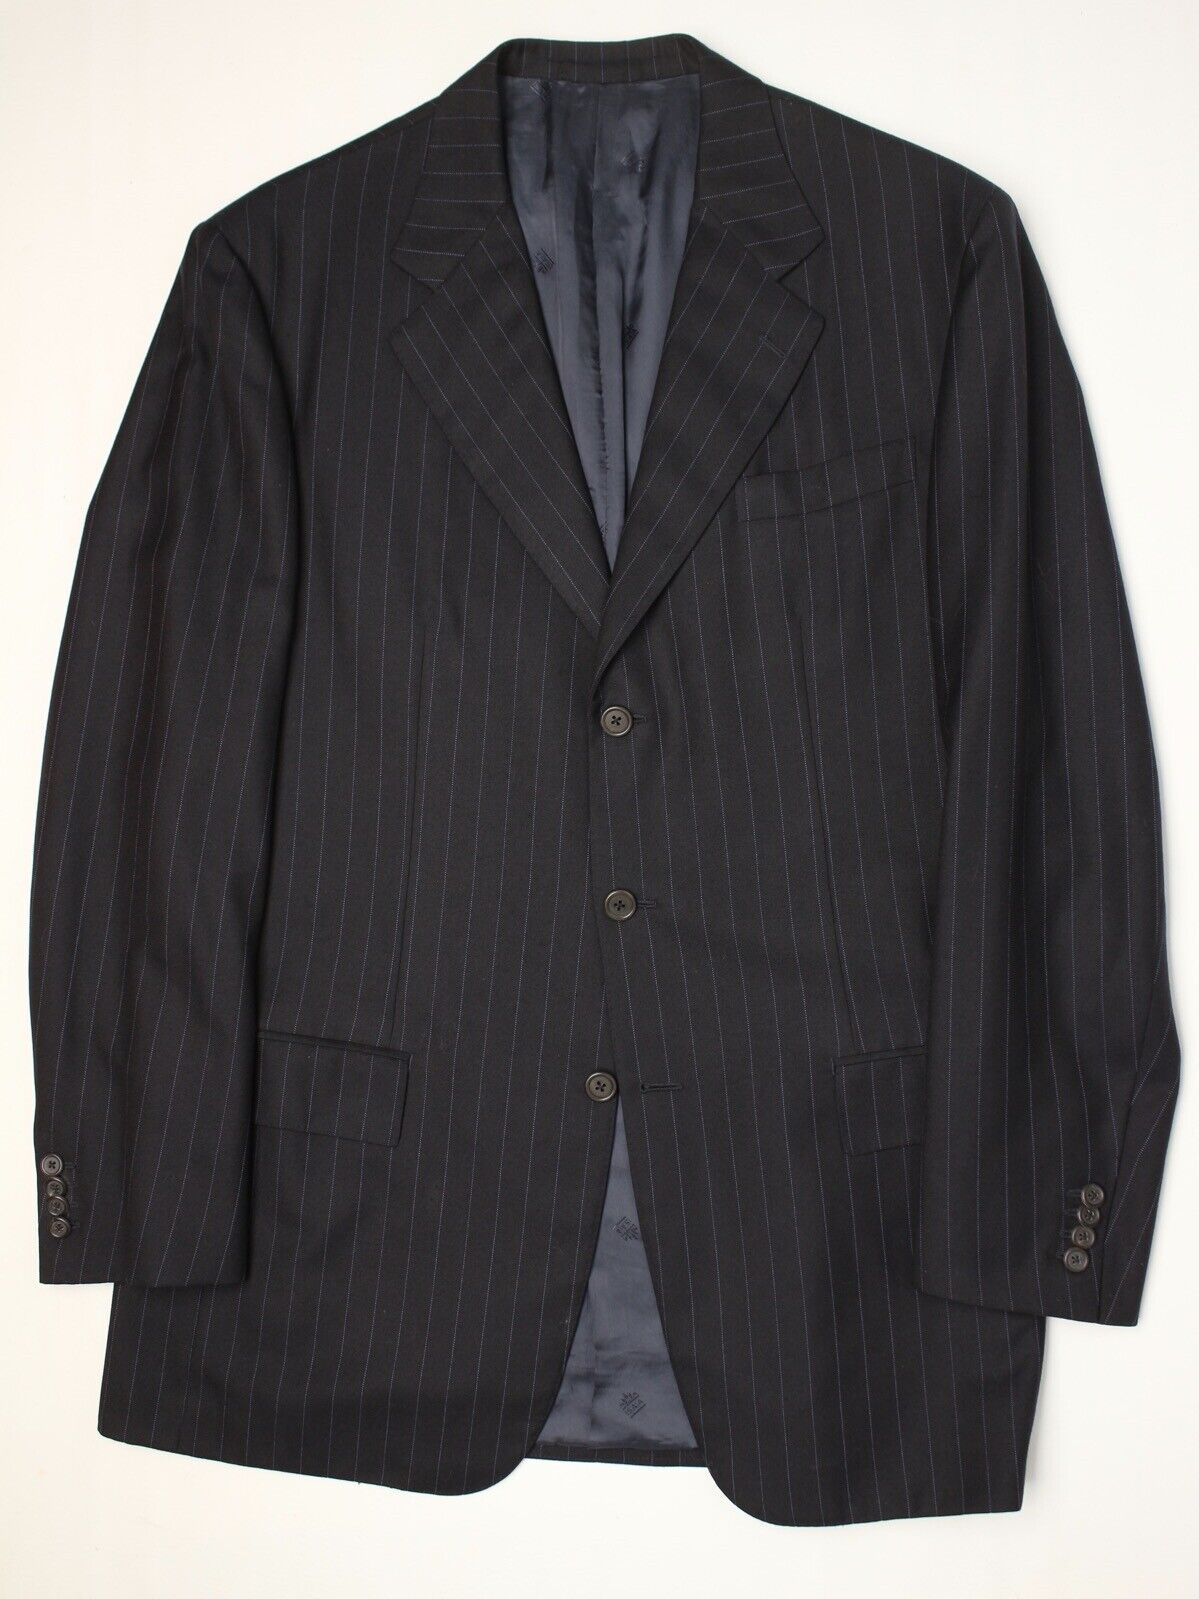 Enrico Isaia Mens Suit 44L 33x34 Navy Blau Pin Stripe Stripe Stripe 3 Bttn Coat Pleated Pants 5db